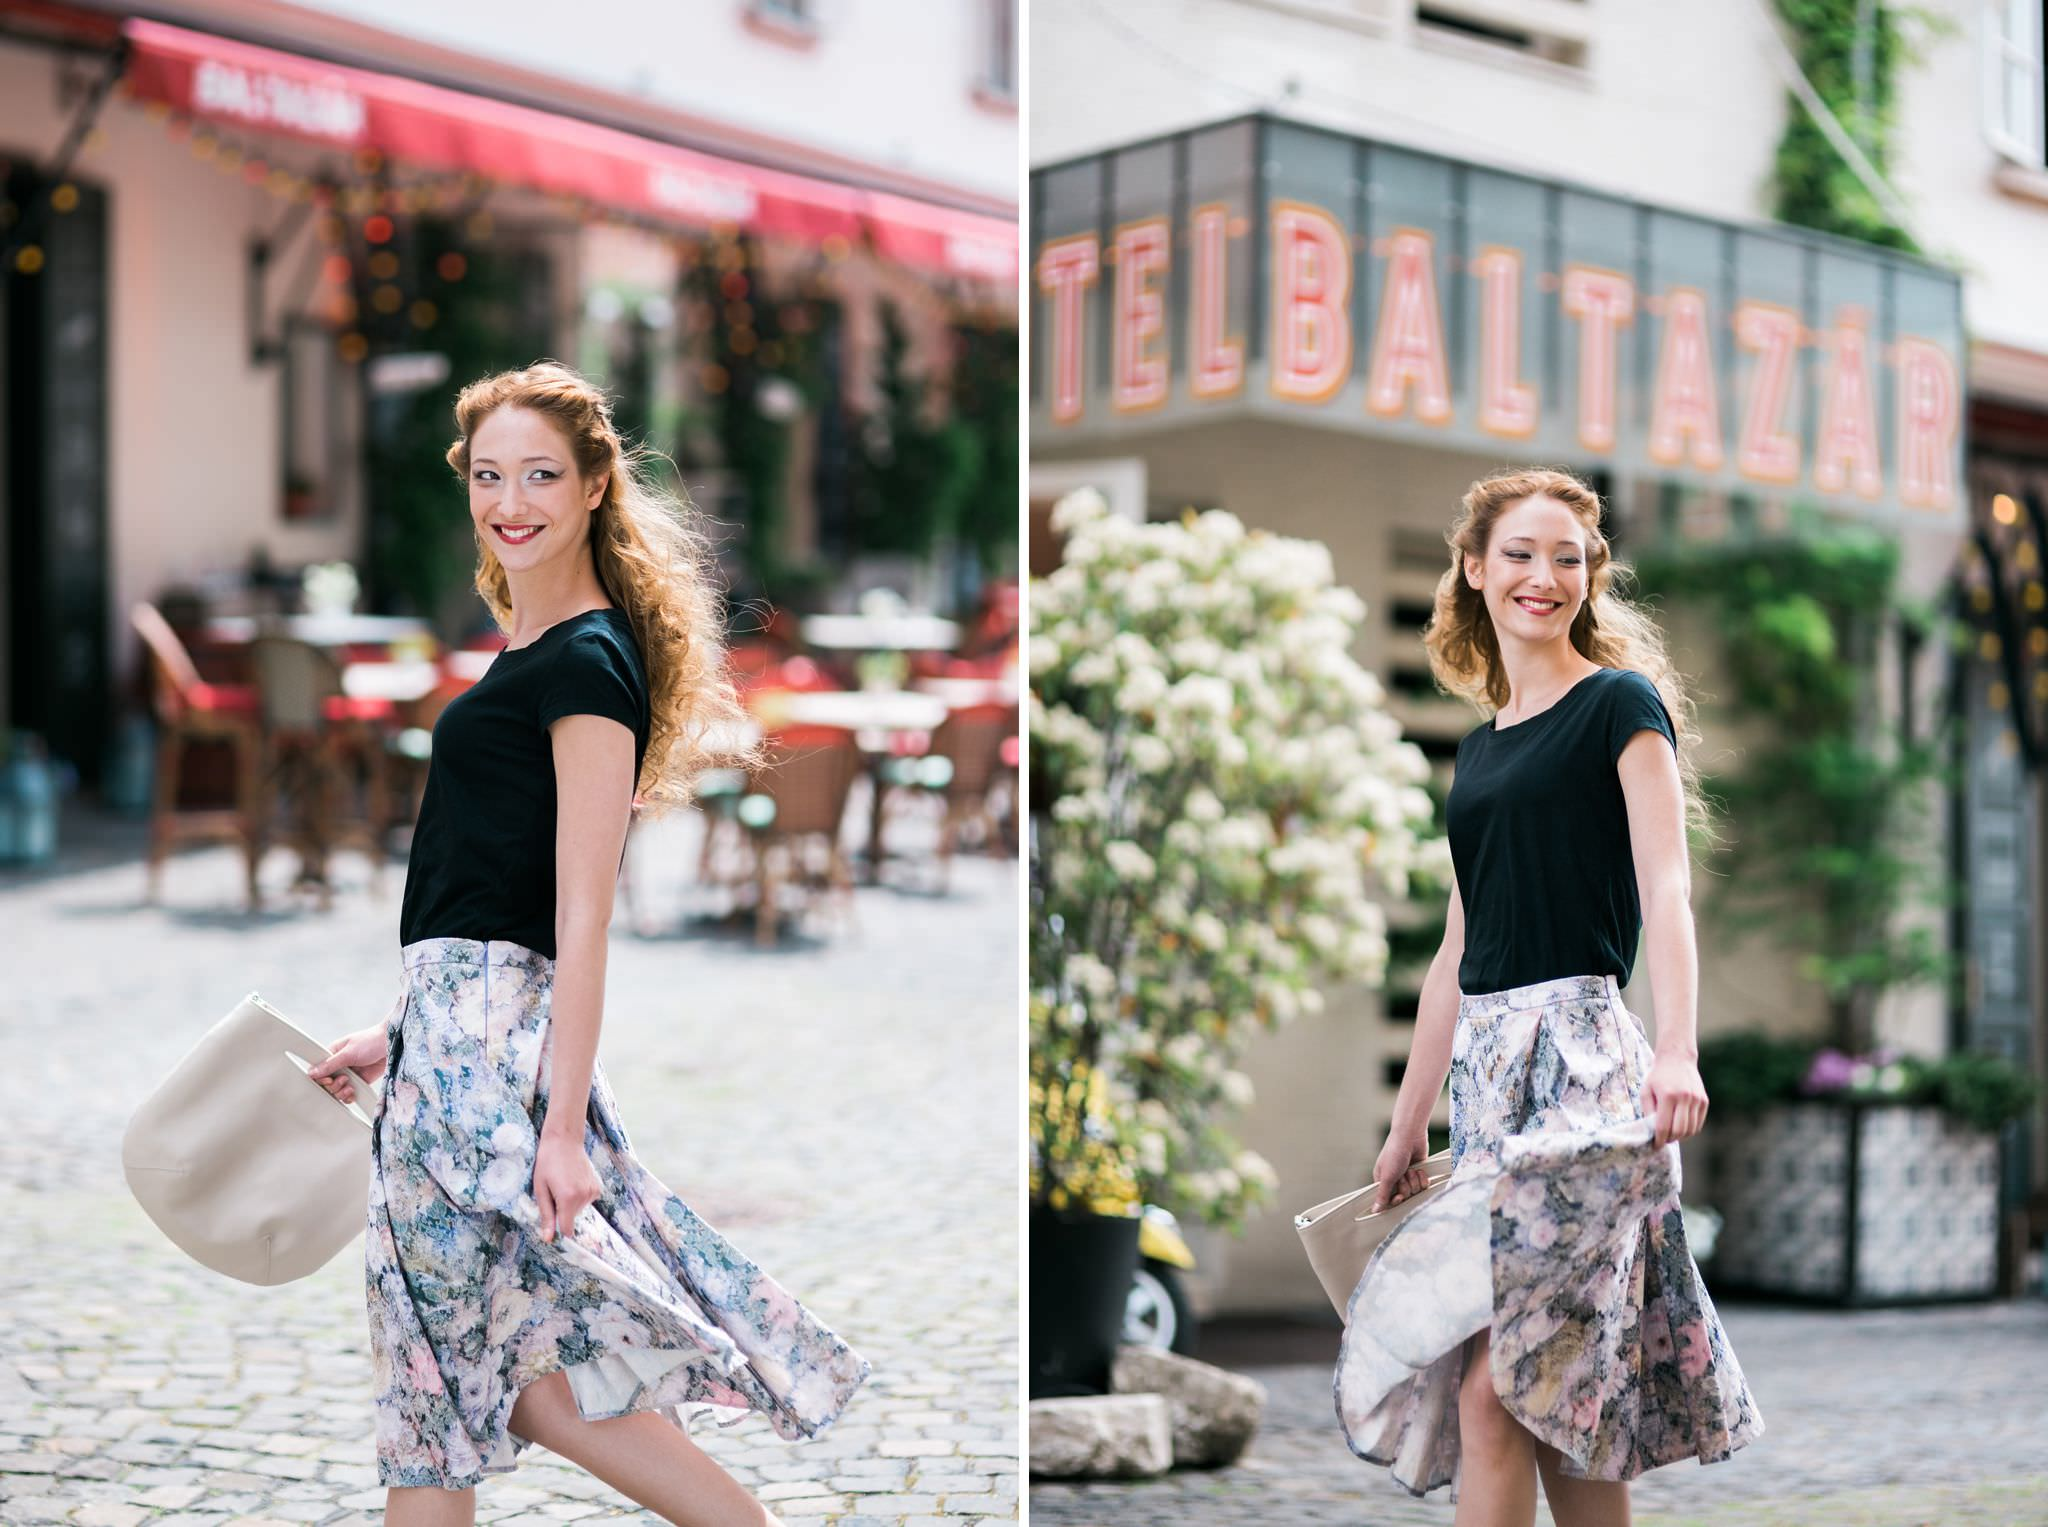 63-Rokolya_Fashion_Editorial_Lookbook_Baltazar_Budapest